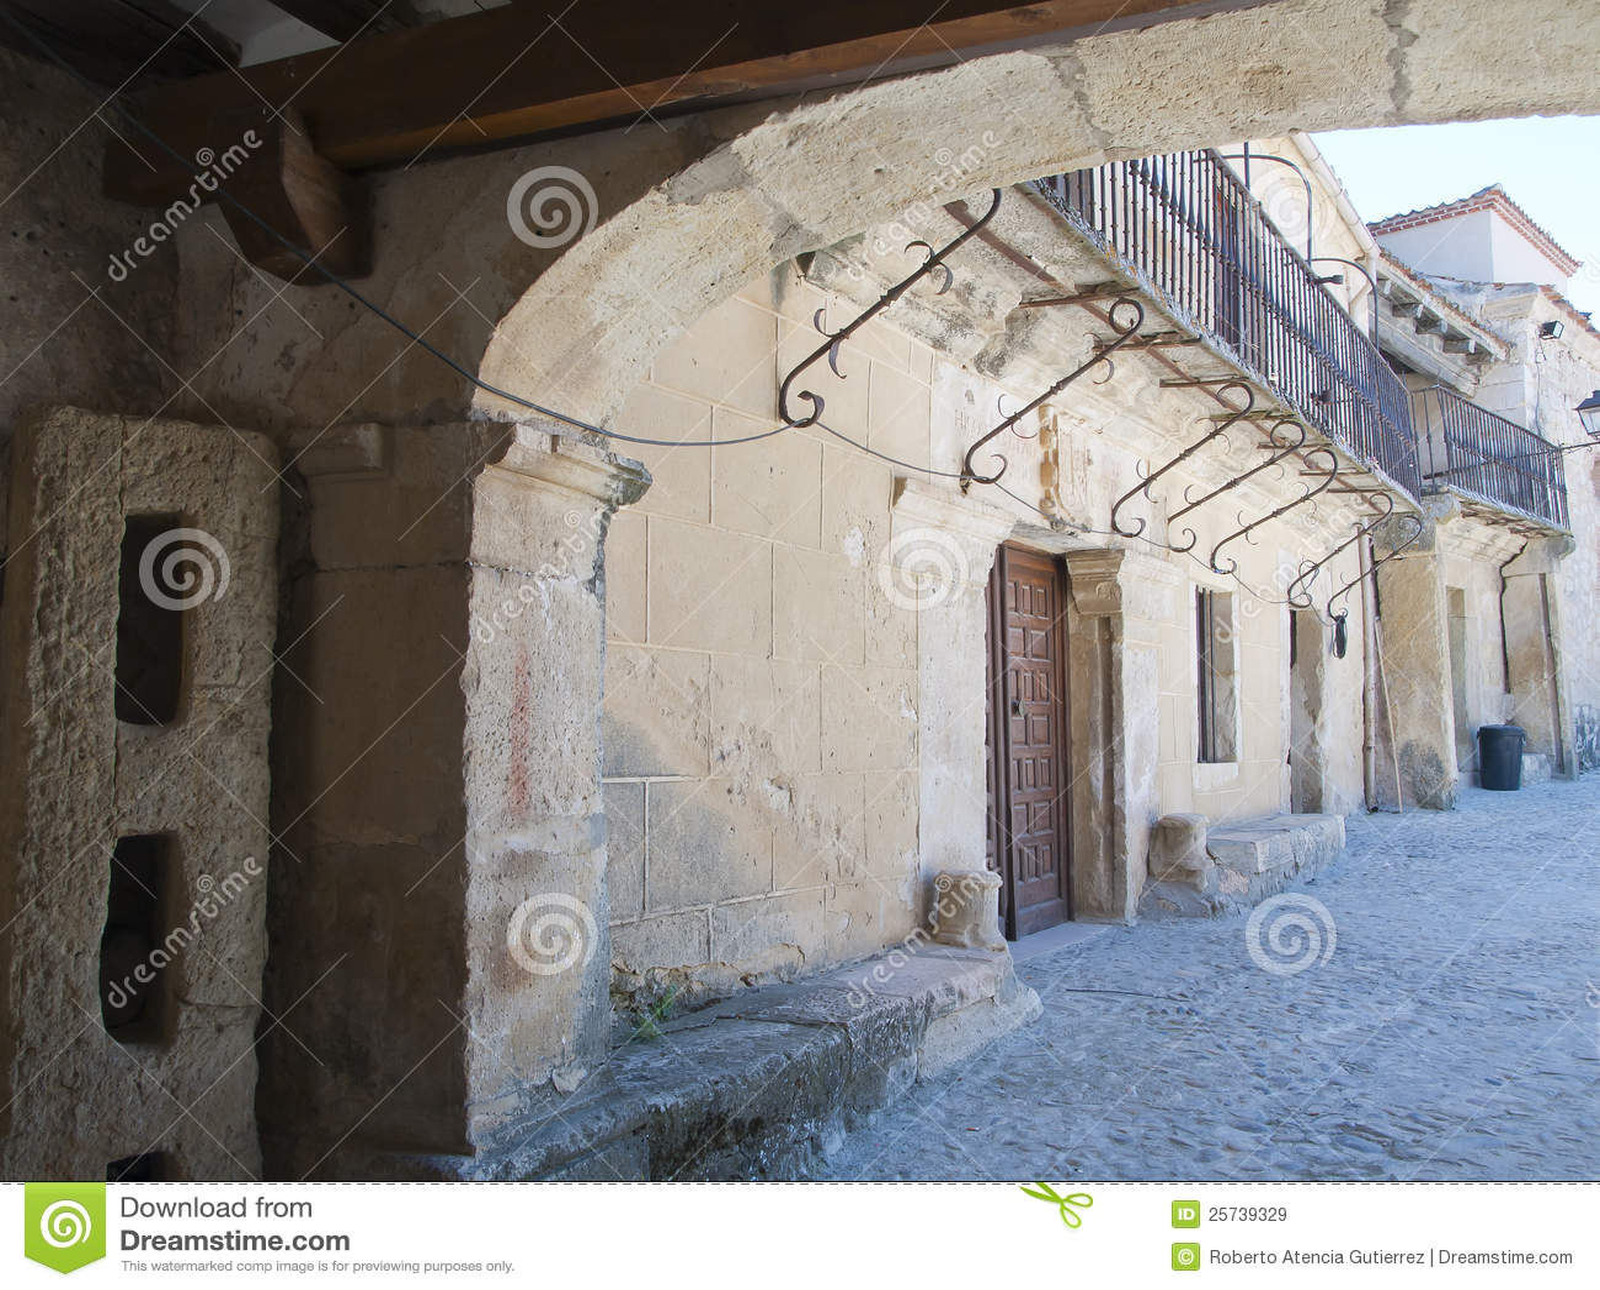 Balconies of houses